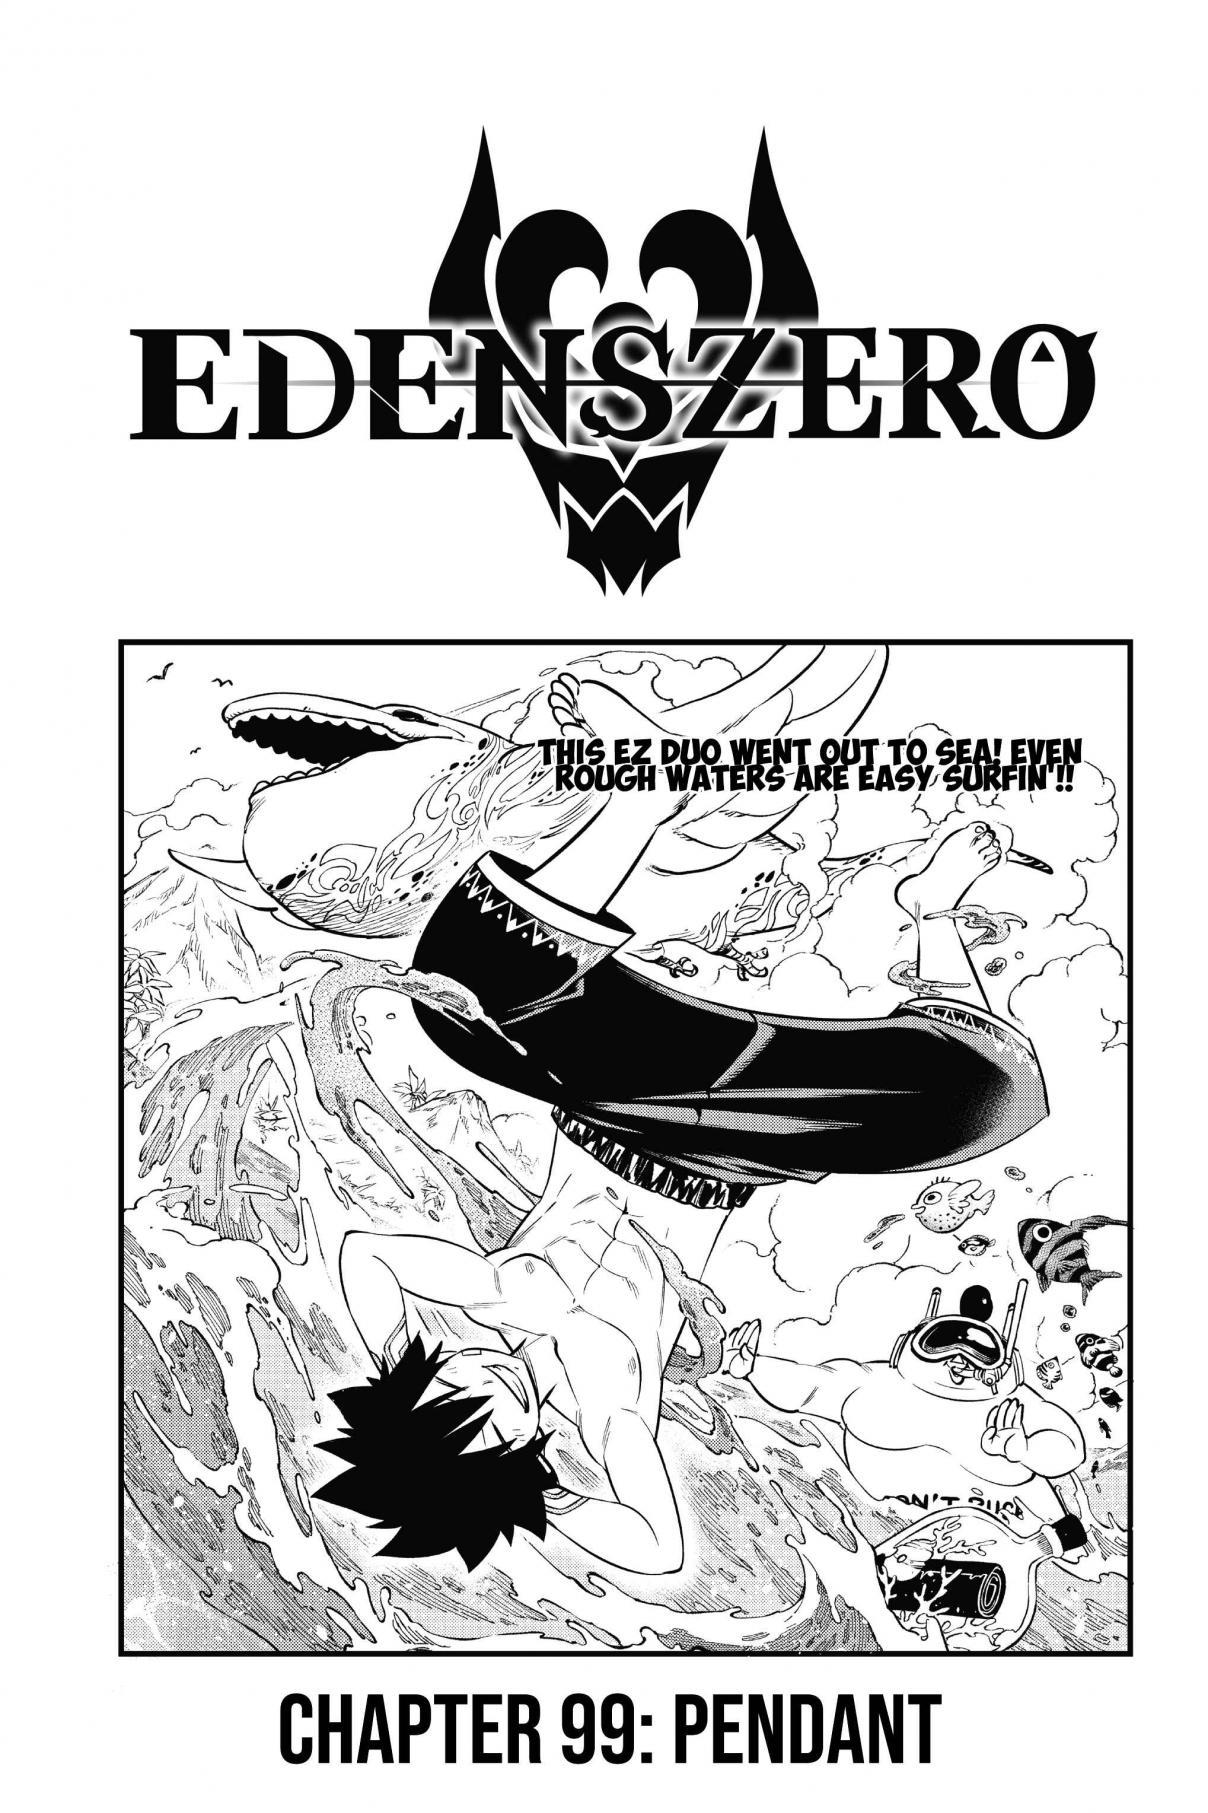 https://img2.nineanime.com/comics/pic4/28/21852/1675250/fc4d25f1b28296b004a6f86195490df8.jpg Page 1